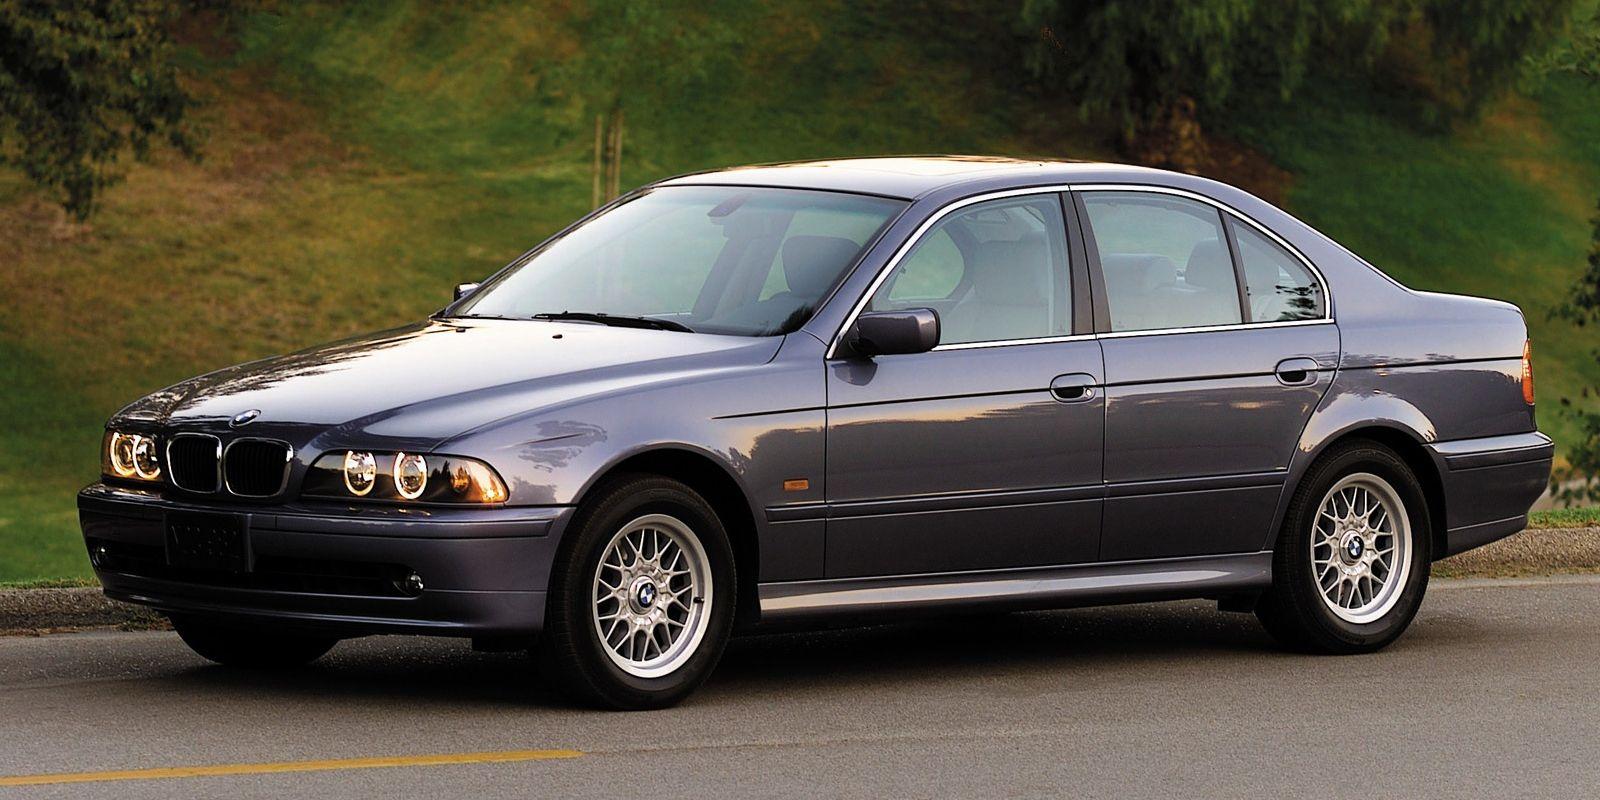 15 Best Used Luxury Cars Under $20K - Used Luxury Cars for $20,000 ...